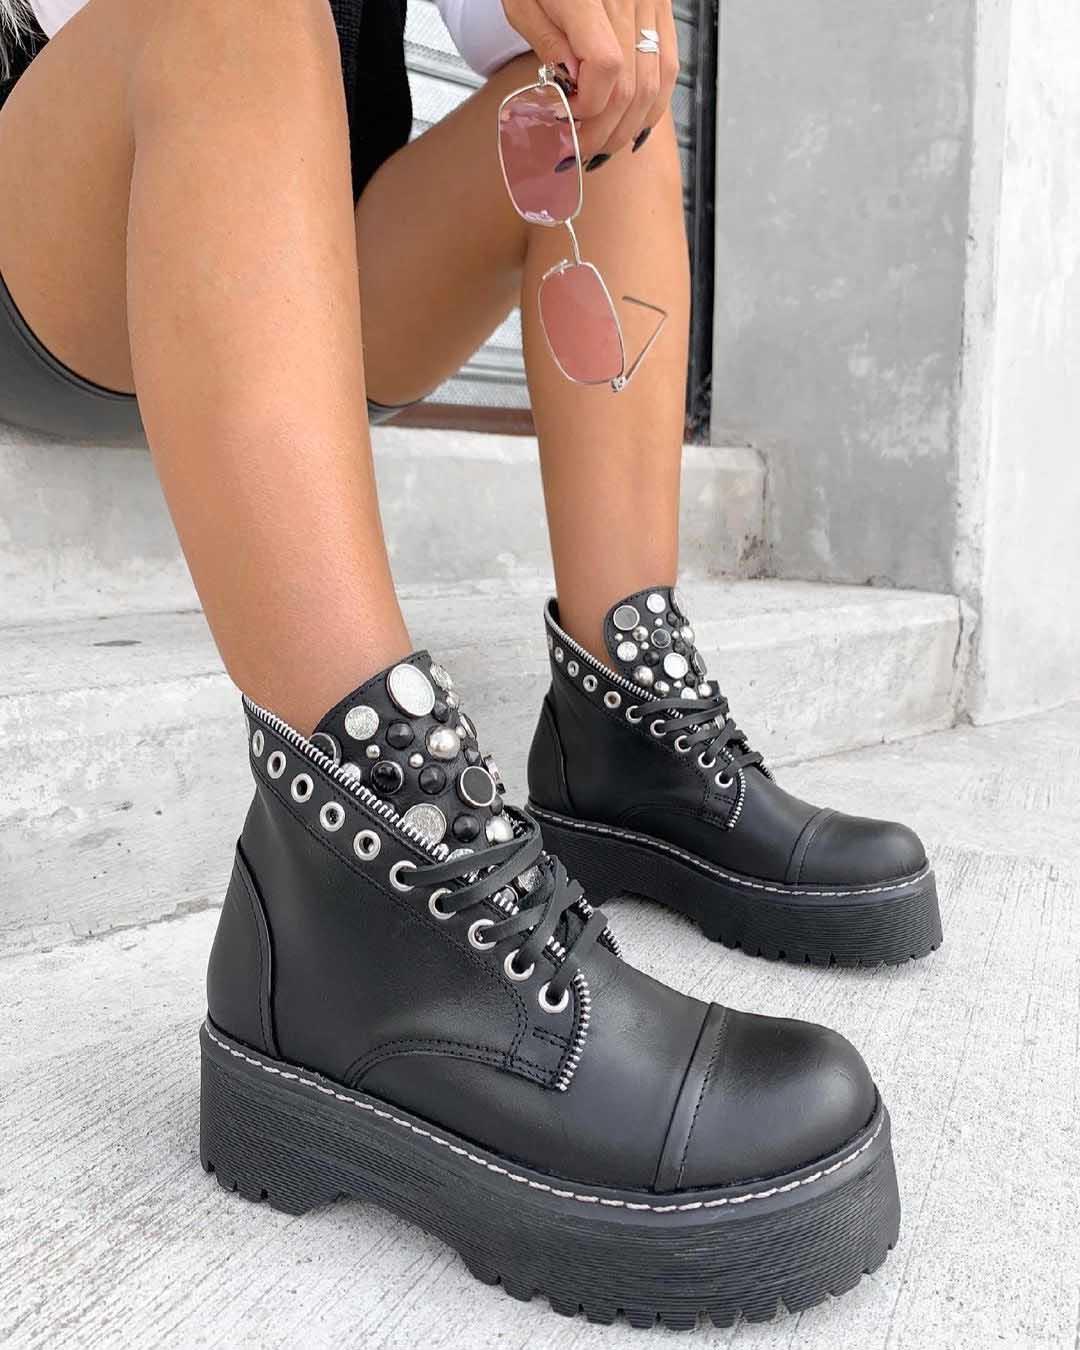 zapatos acordonados tipo borcegos con taches mujer moda invierno 2021